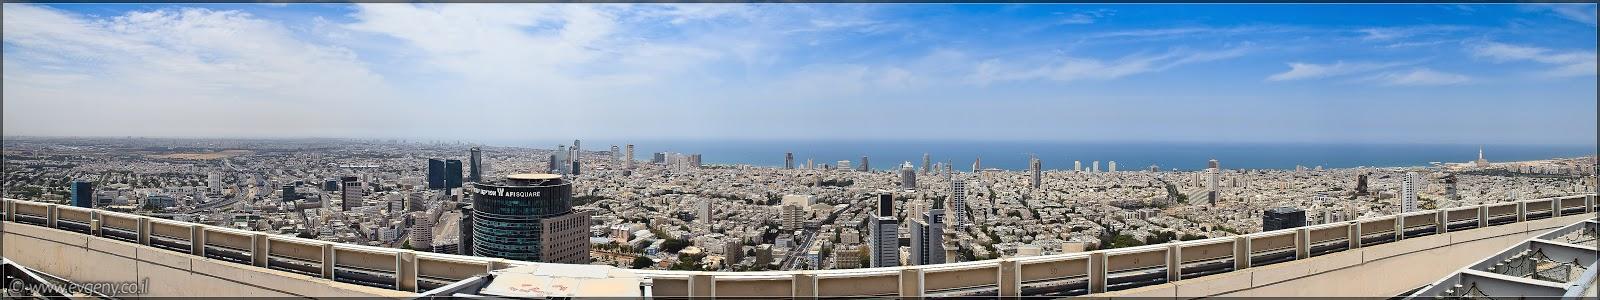 Фото: Панорама: Тель Авив с крыши Азриэли